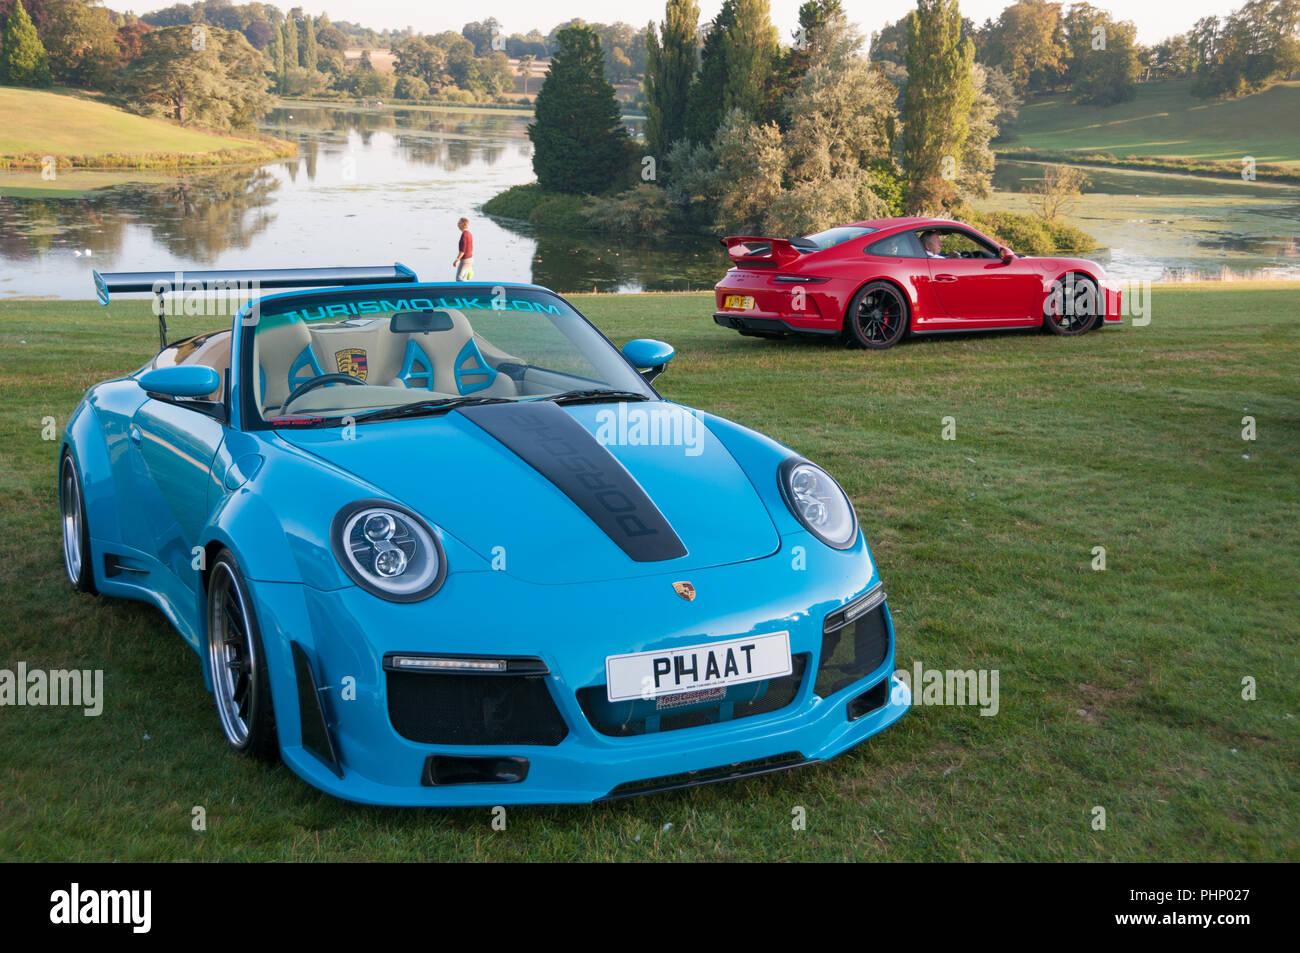 Woodstock, Oxfordshire, UK. 02nd Sep, 2018. Over 400 Porsches arrive at Blenheim Palace. Salon Prive Concours, Blenheim Palace Classic and Supercar event, Woodstock, Oxfordshire, 2nd Sep 2018 Credit: Stanislav Halcin/Alamy Live News Stock Photo